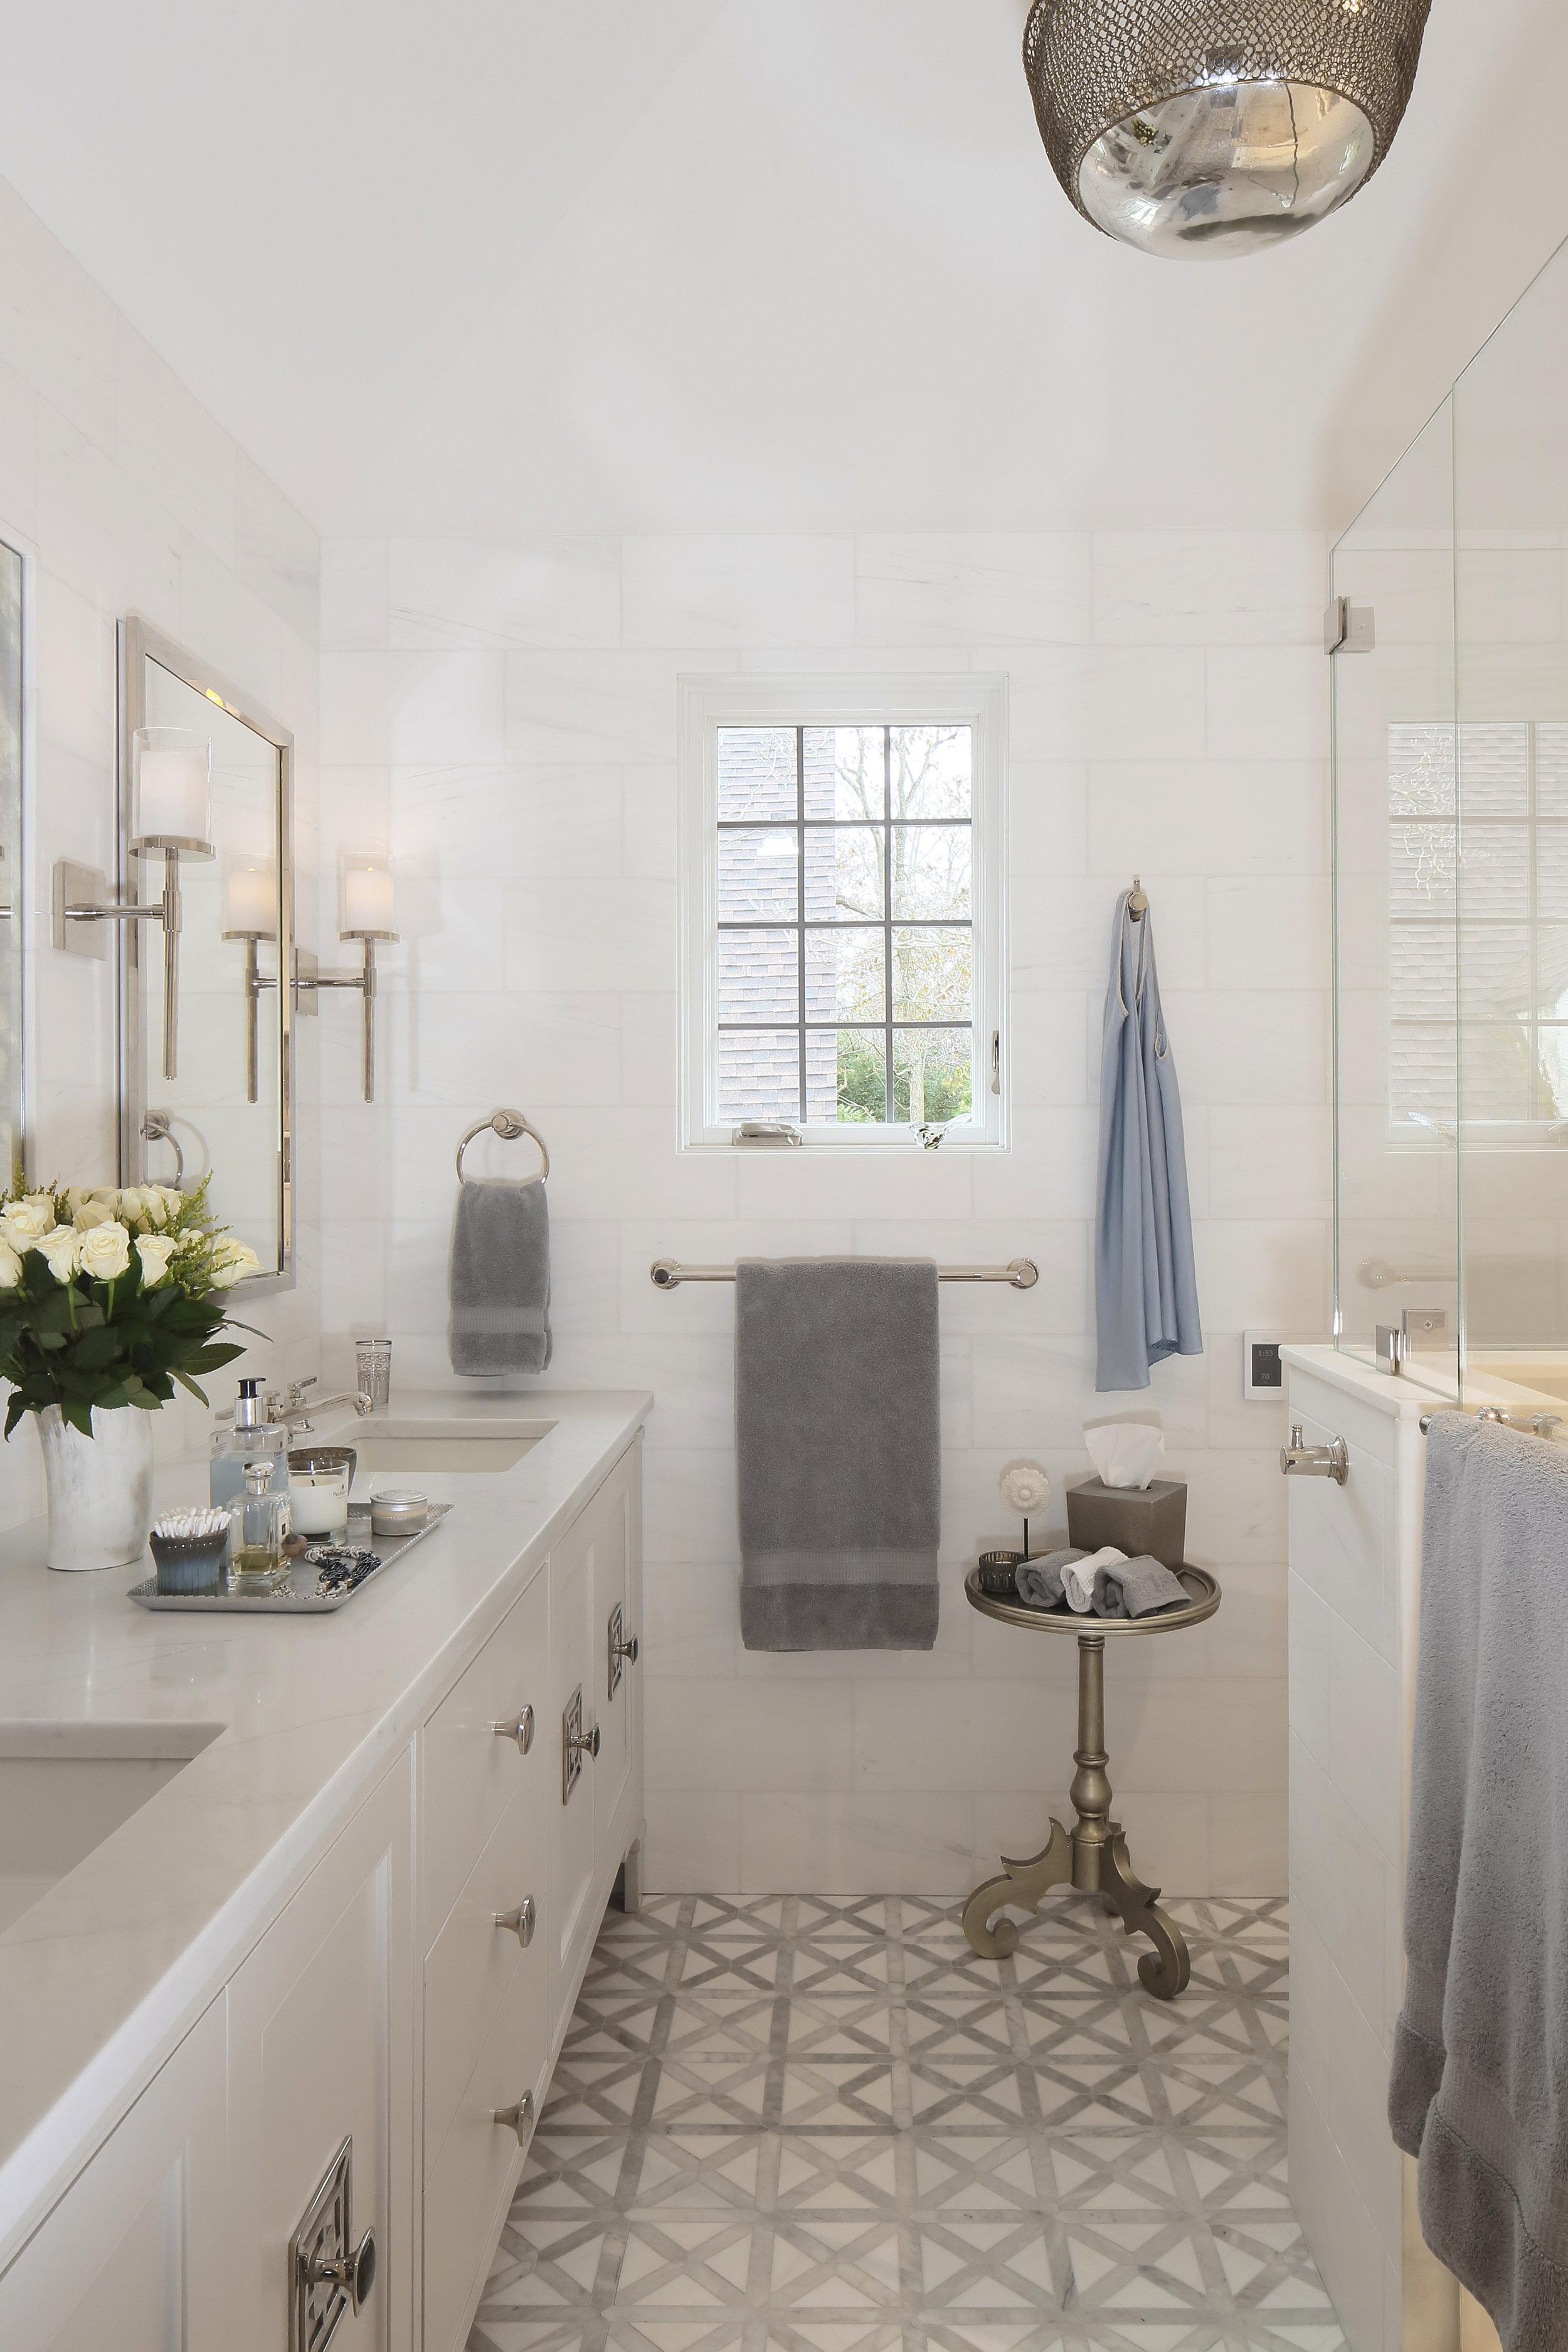 KAM DESIGN_Master Bath_Larchmont_2018_643a.jpg